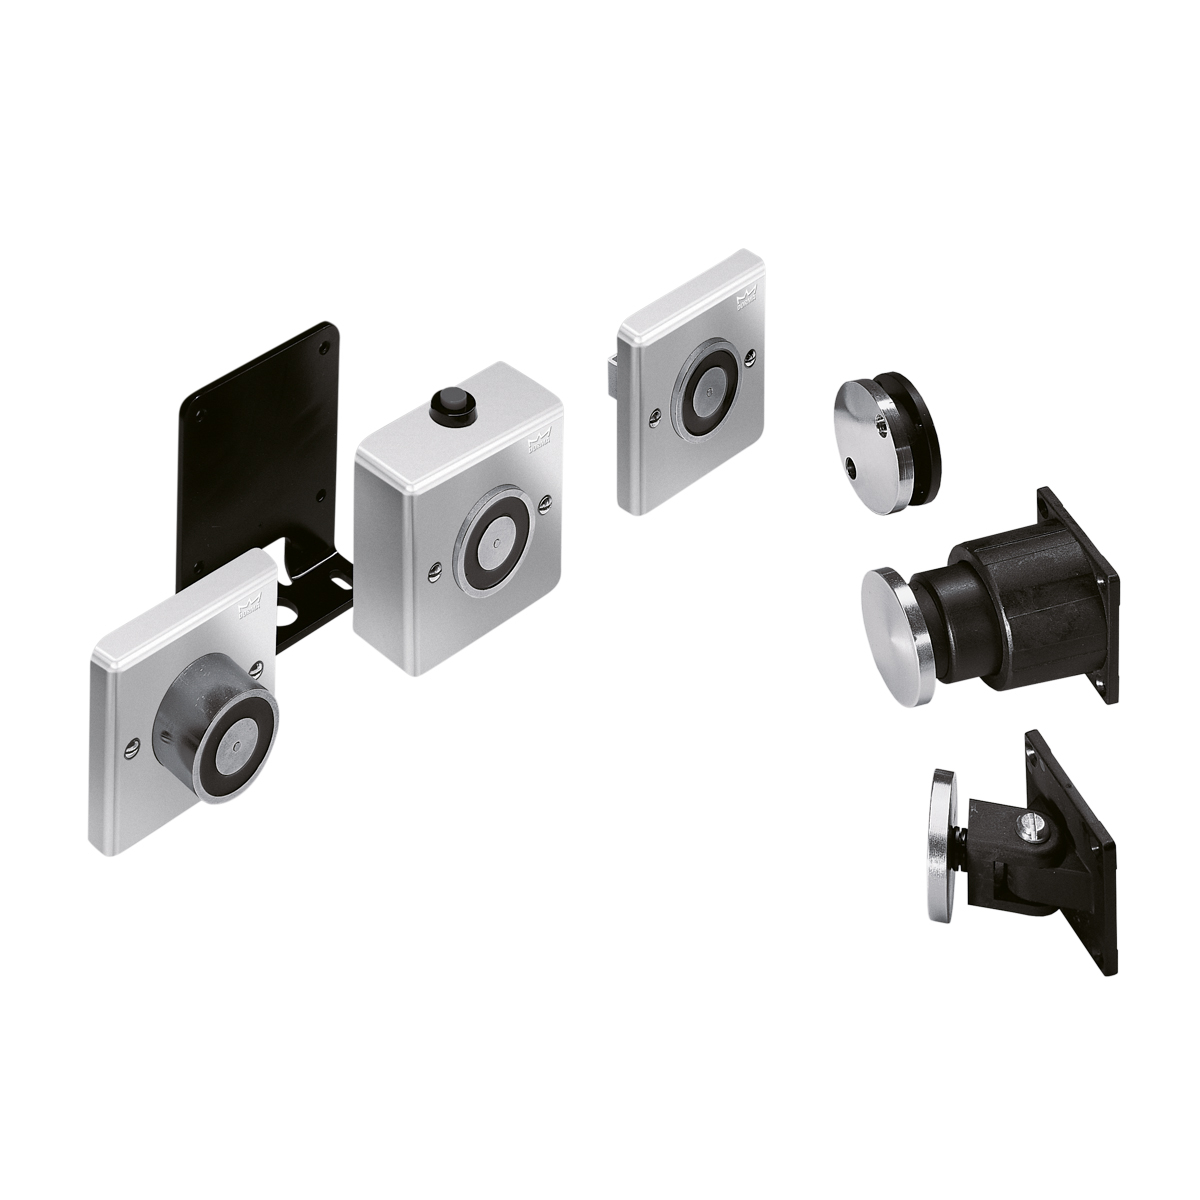 Dorma Em Series Hold Open Magnets Schlage Maglock Wiring Diagram Magnete 054538 1200x1200